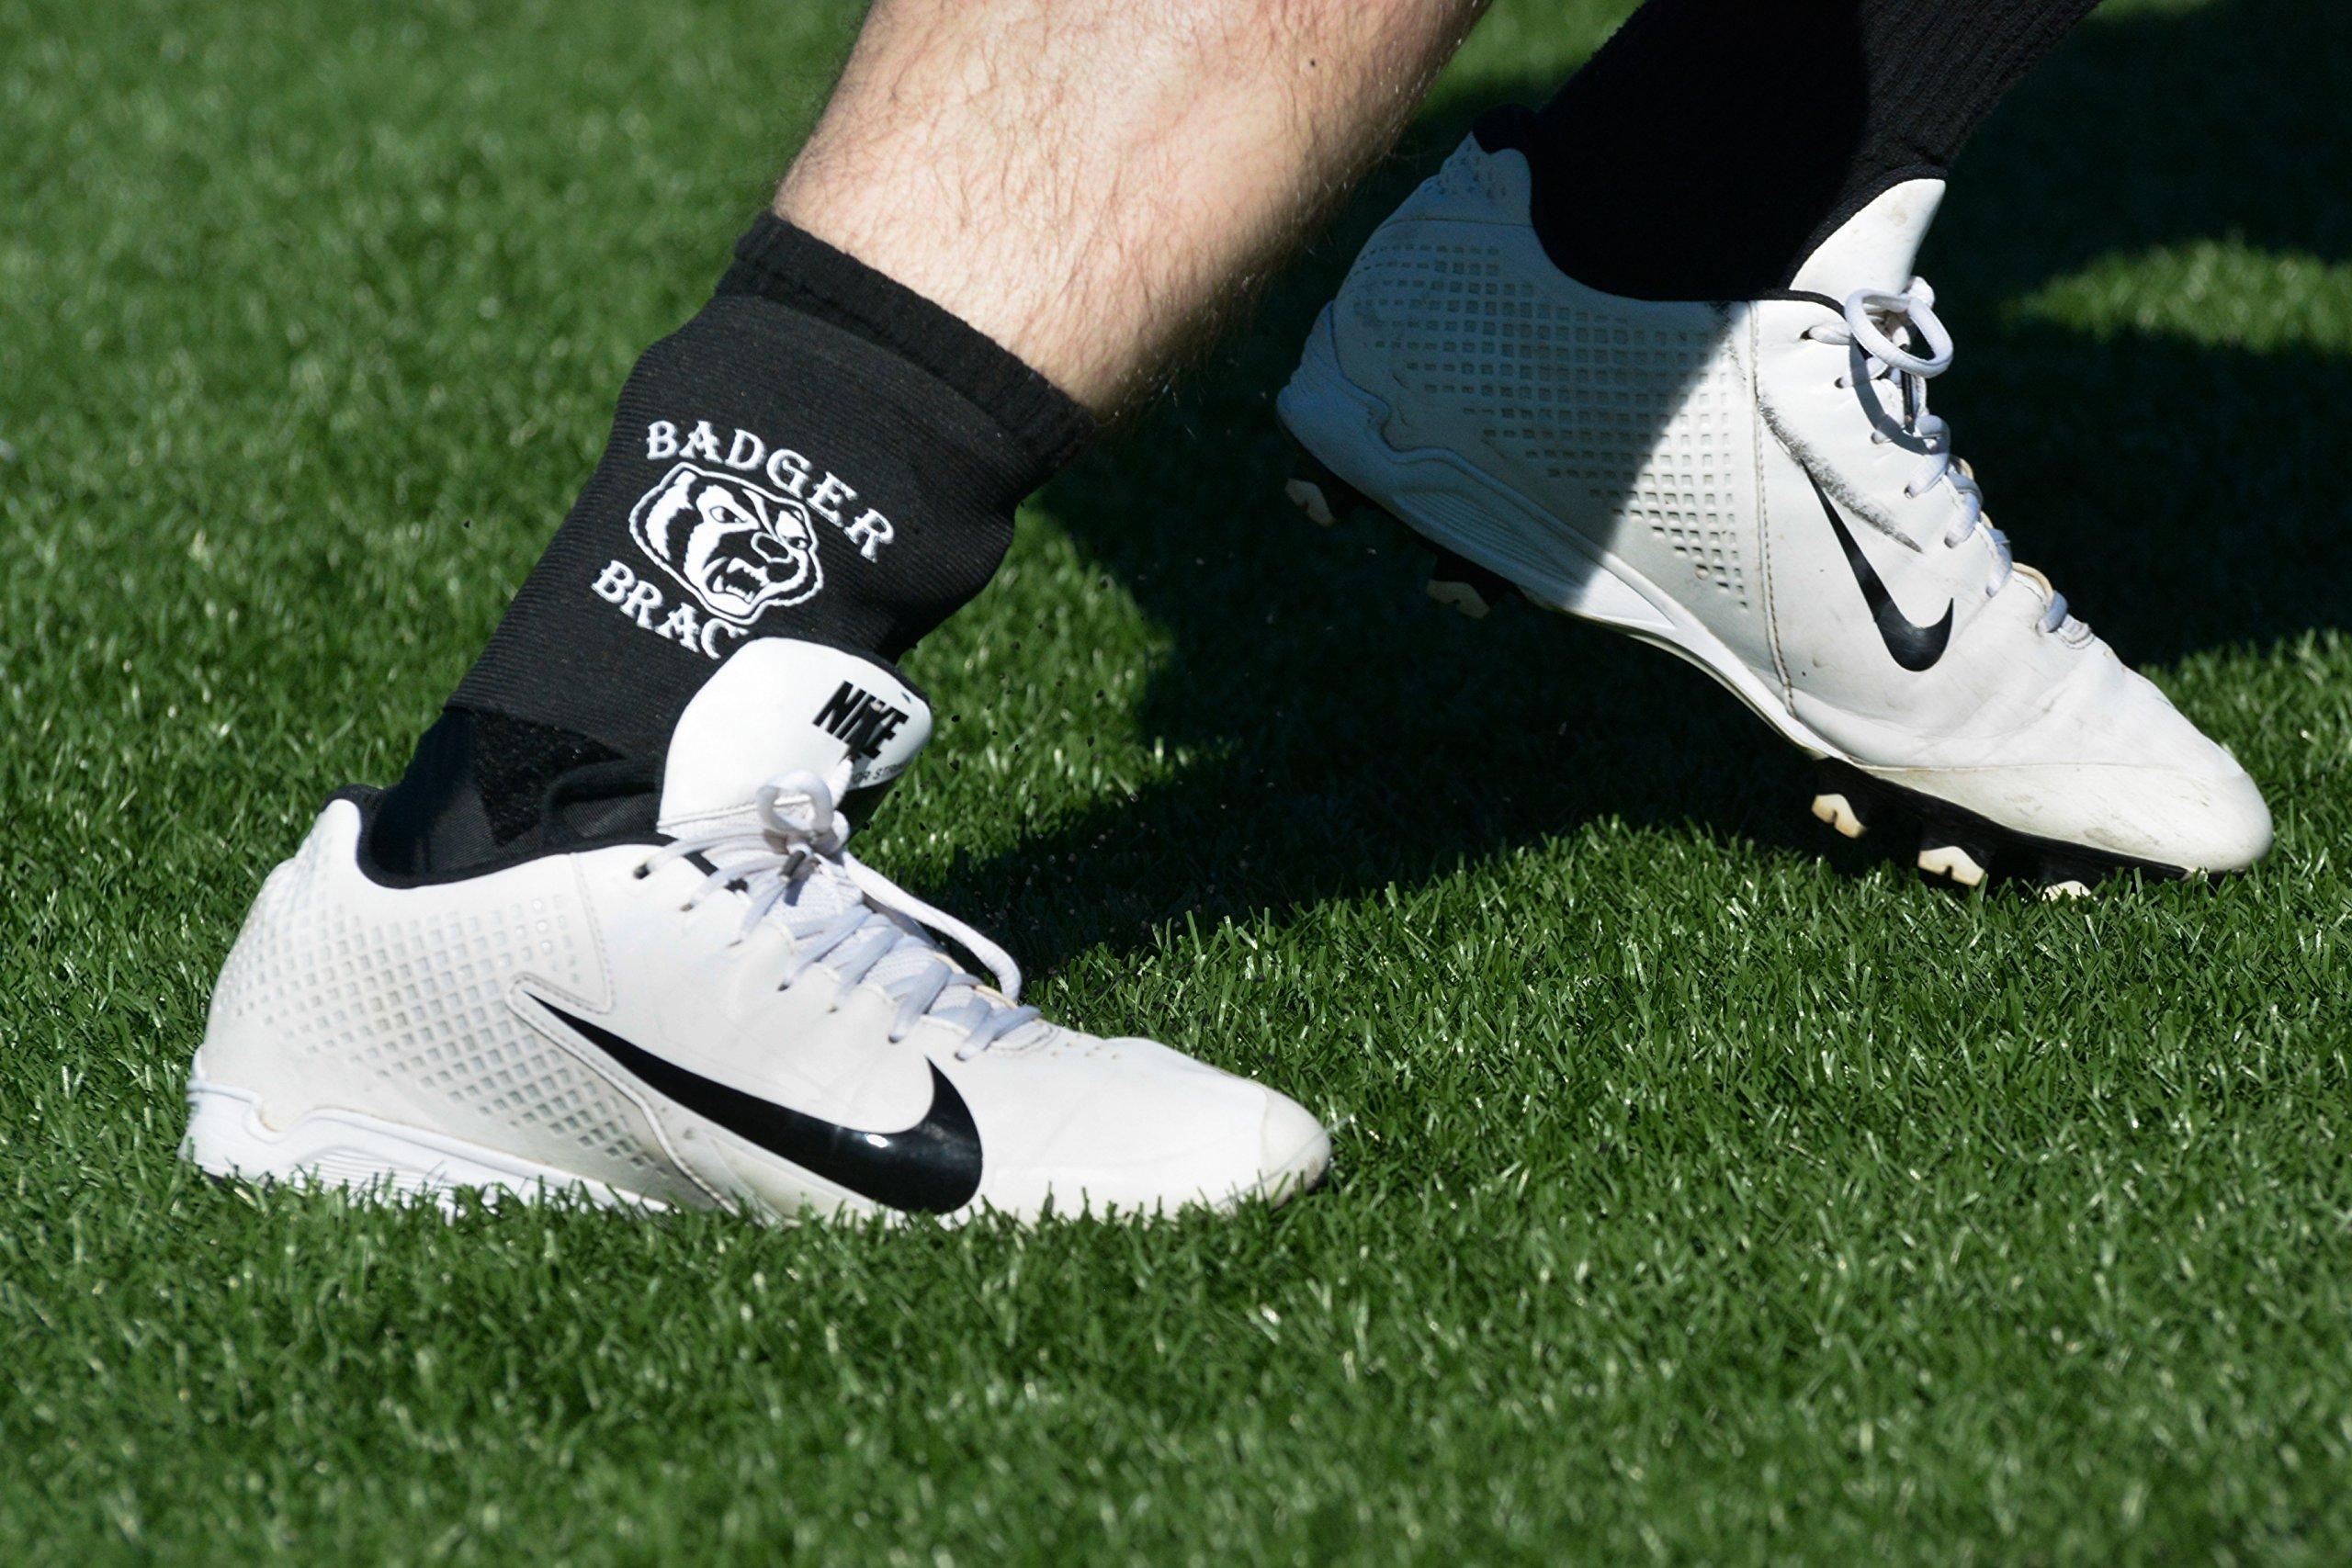 Badger Ankle Braces (Men's 10 Right) by Badger Braces, LLC (Image #4)